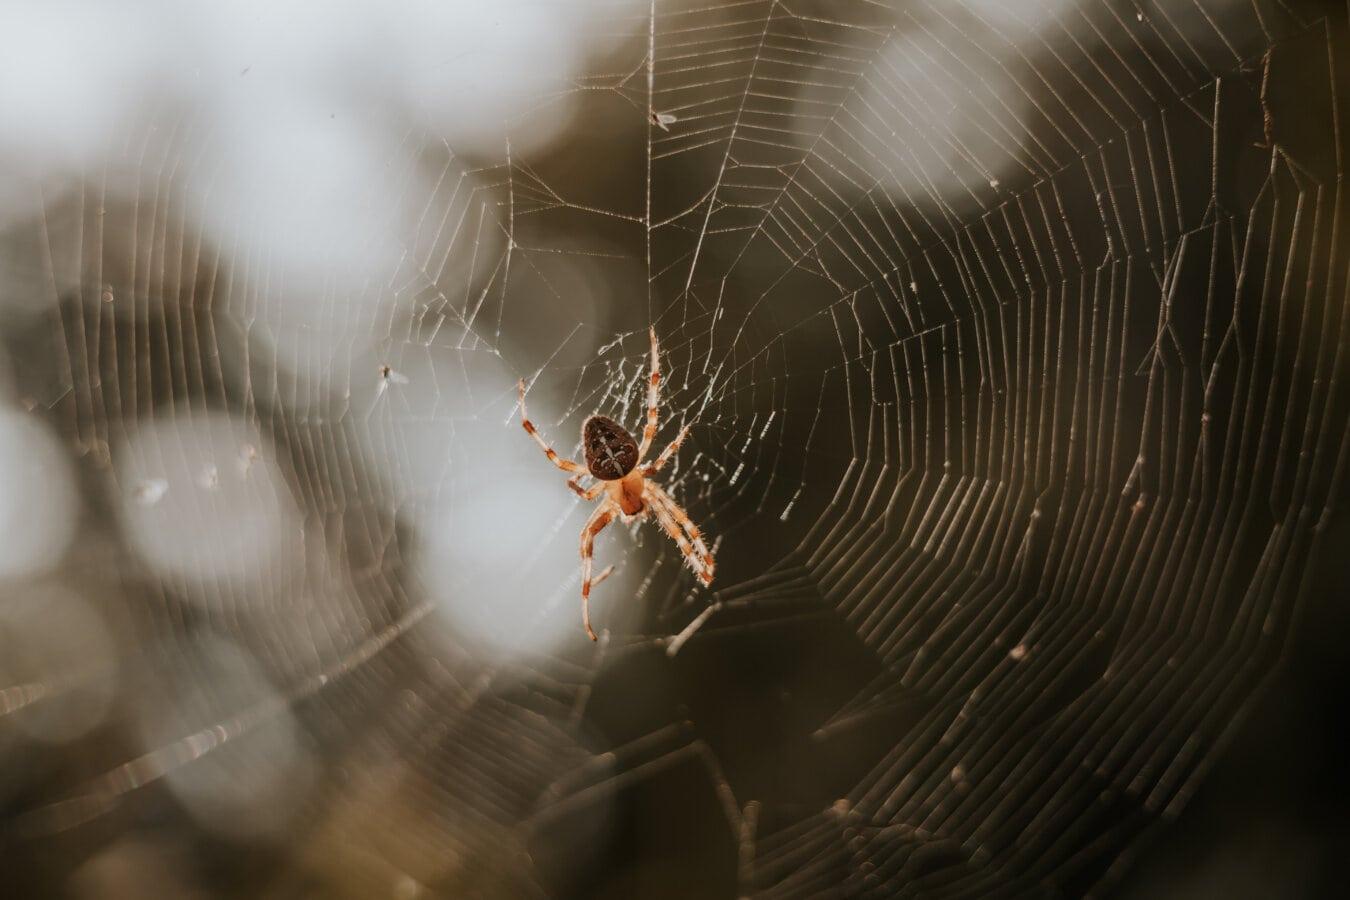 spider, spider web, animal, big, insect, backlight, trap, cobweb, spiderweb, danger